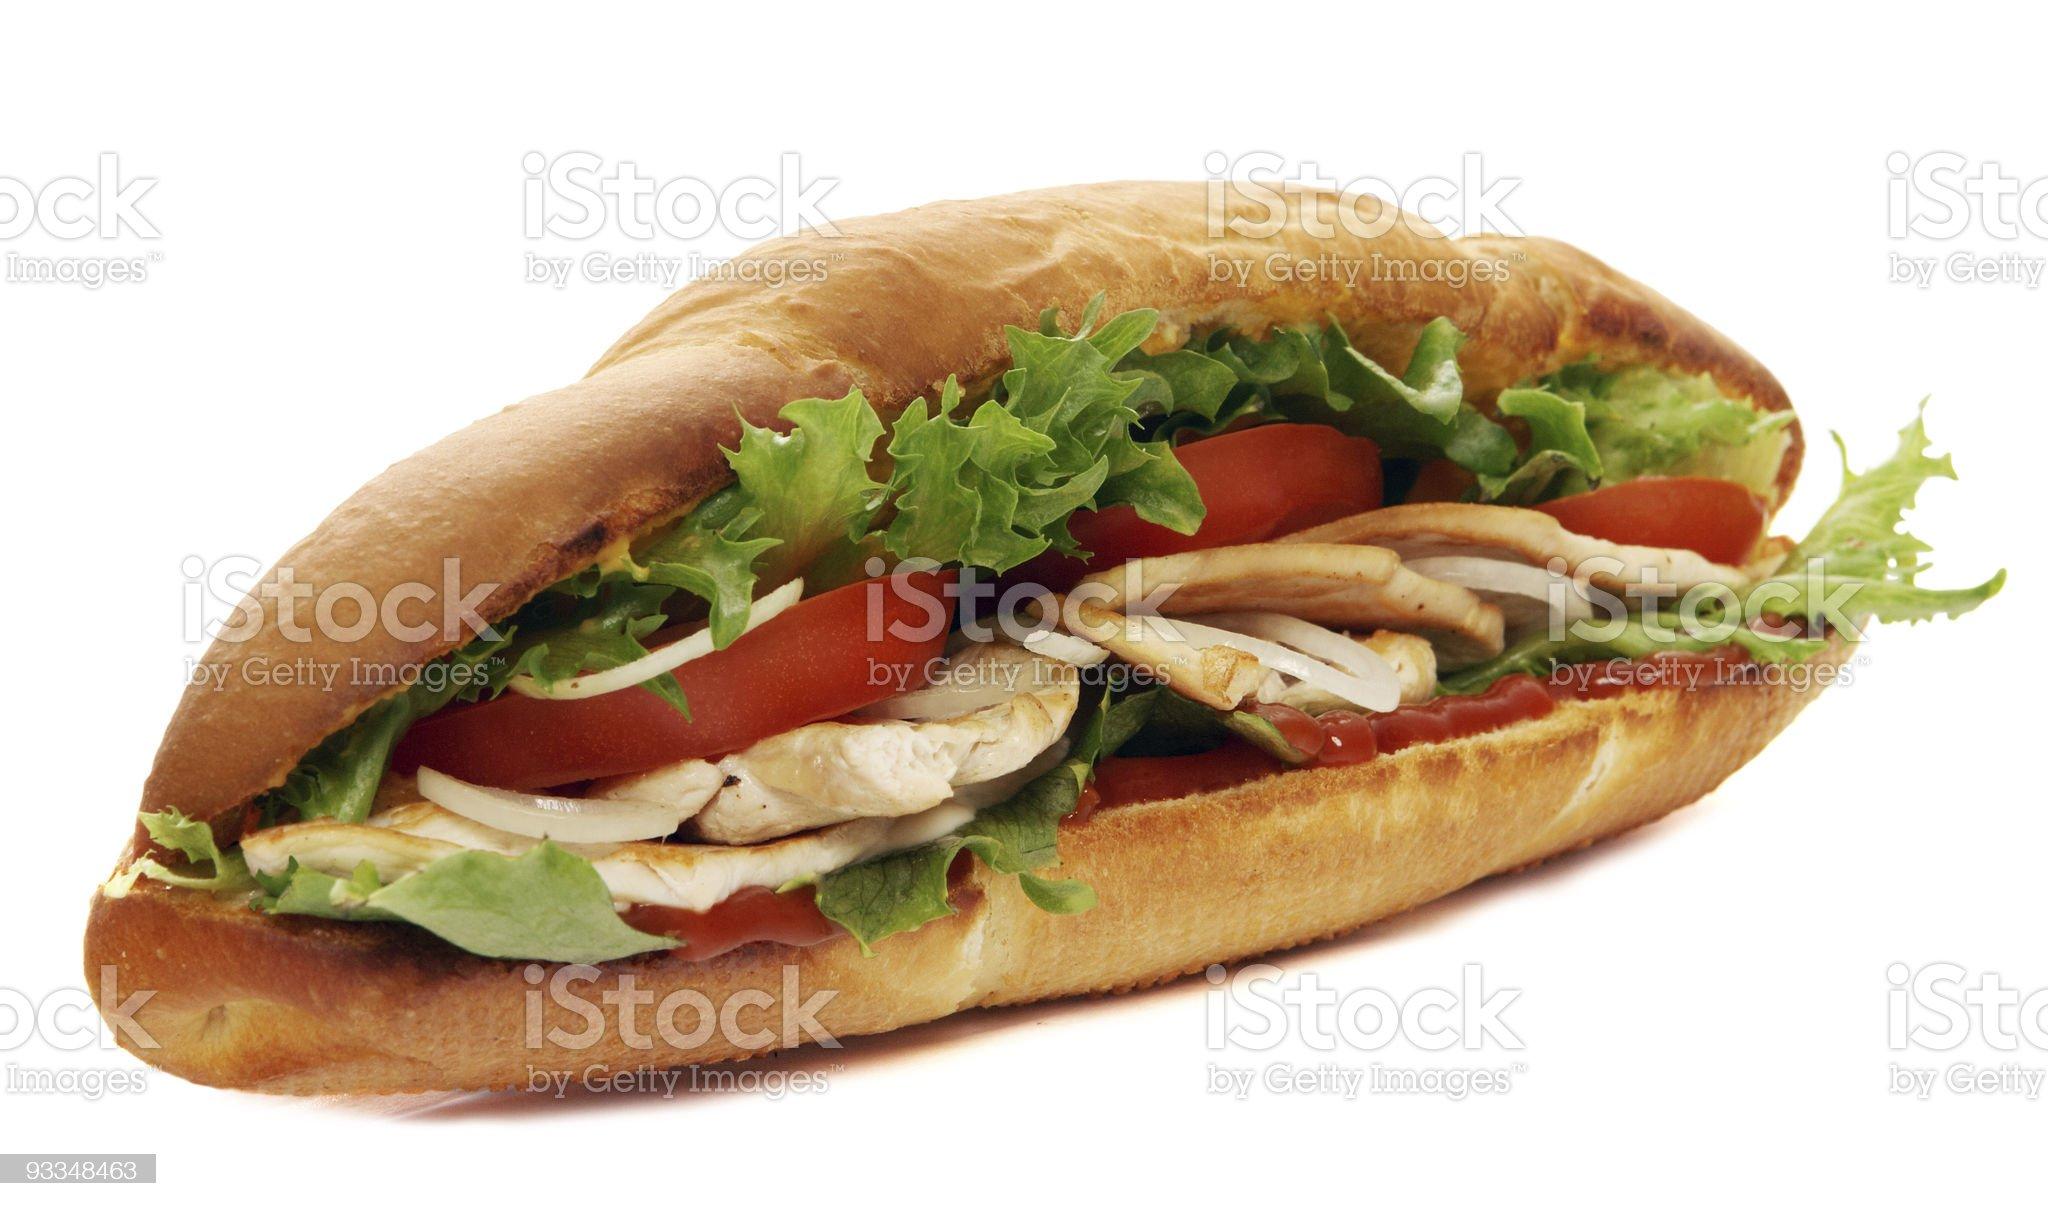 turkey breast sub sandwich royalty-free stock photo